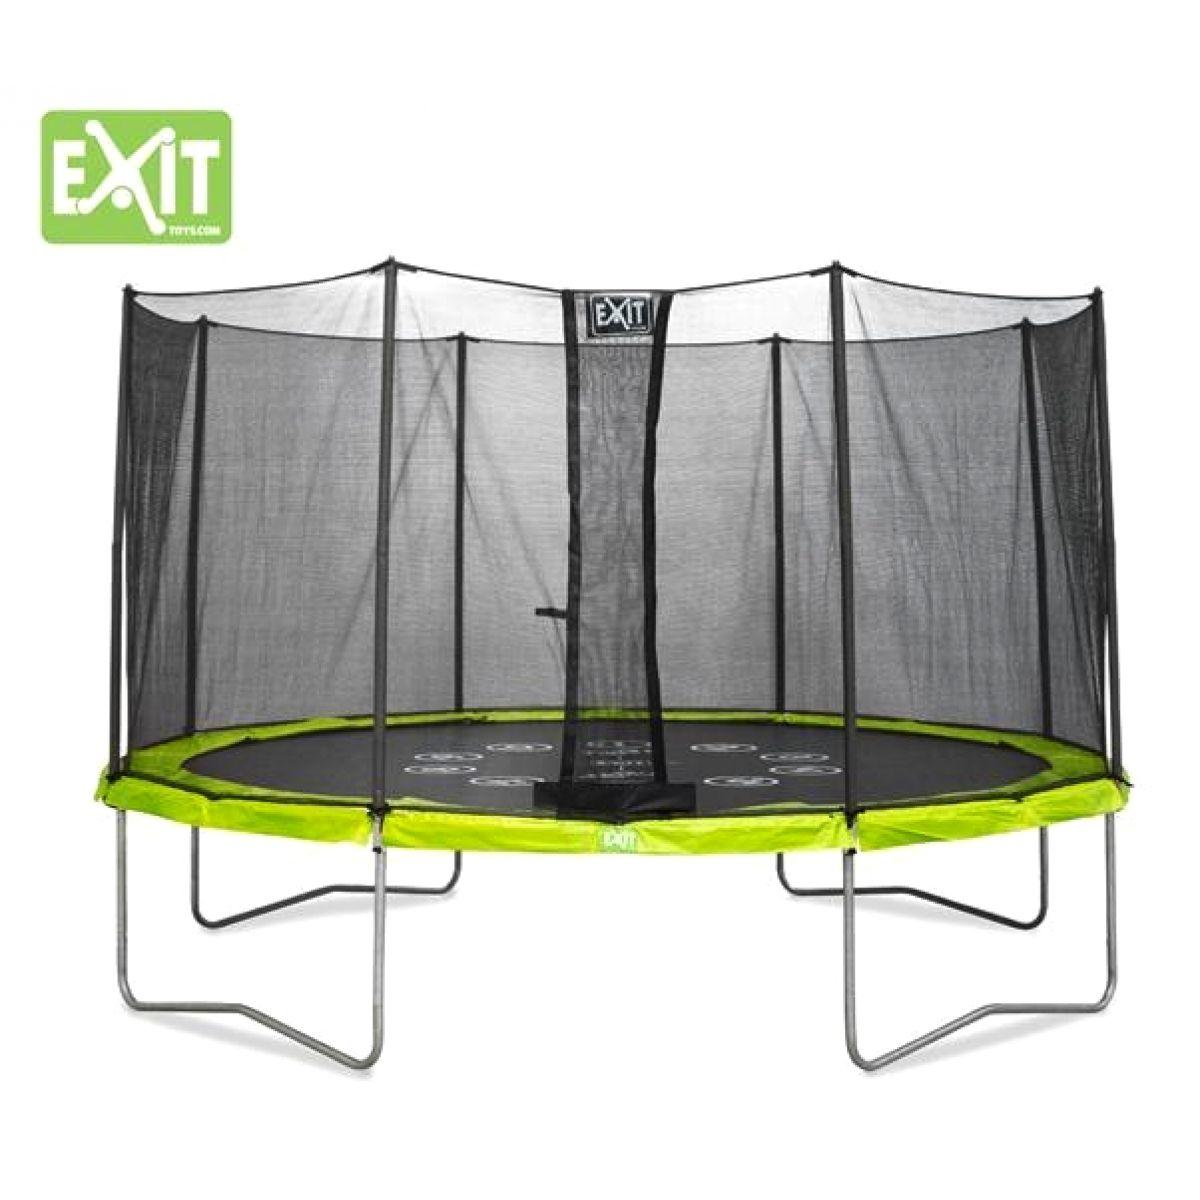 Exit Trampolína Twist se sítí 427 cm Green Grey